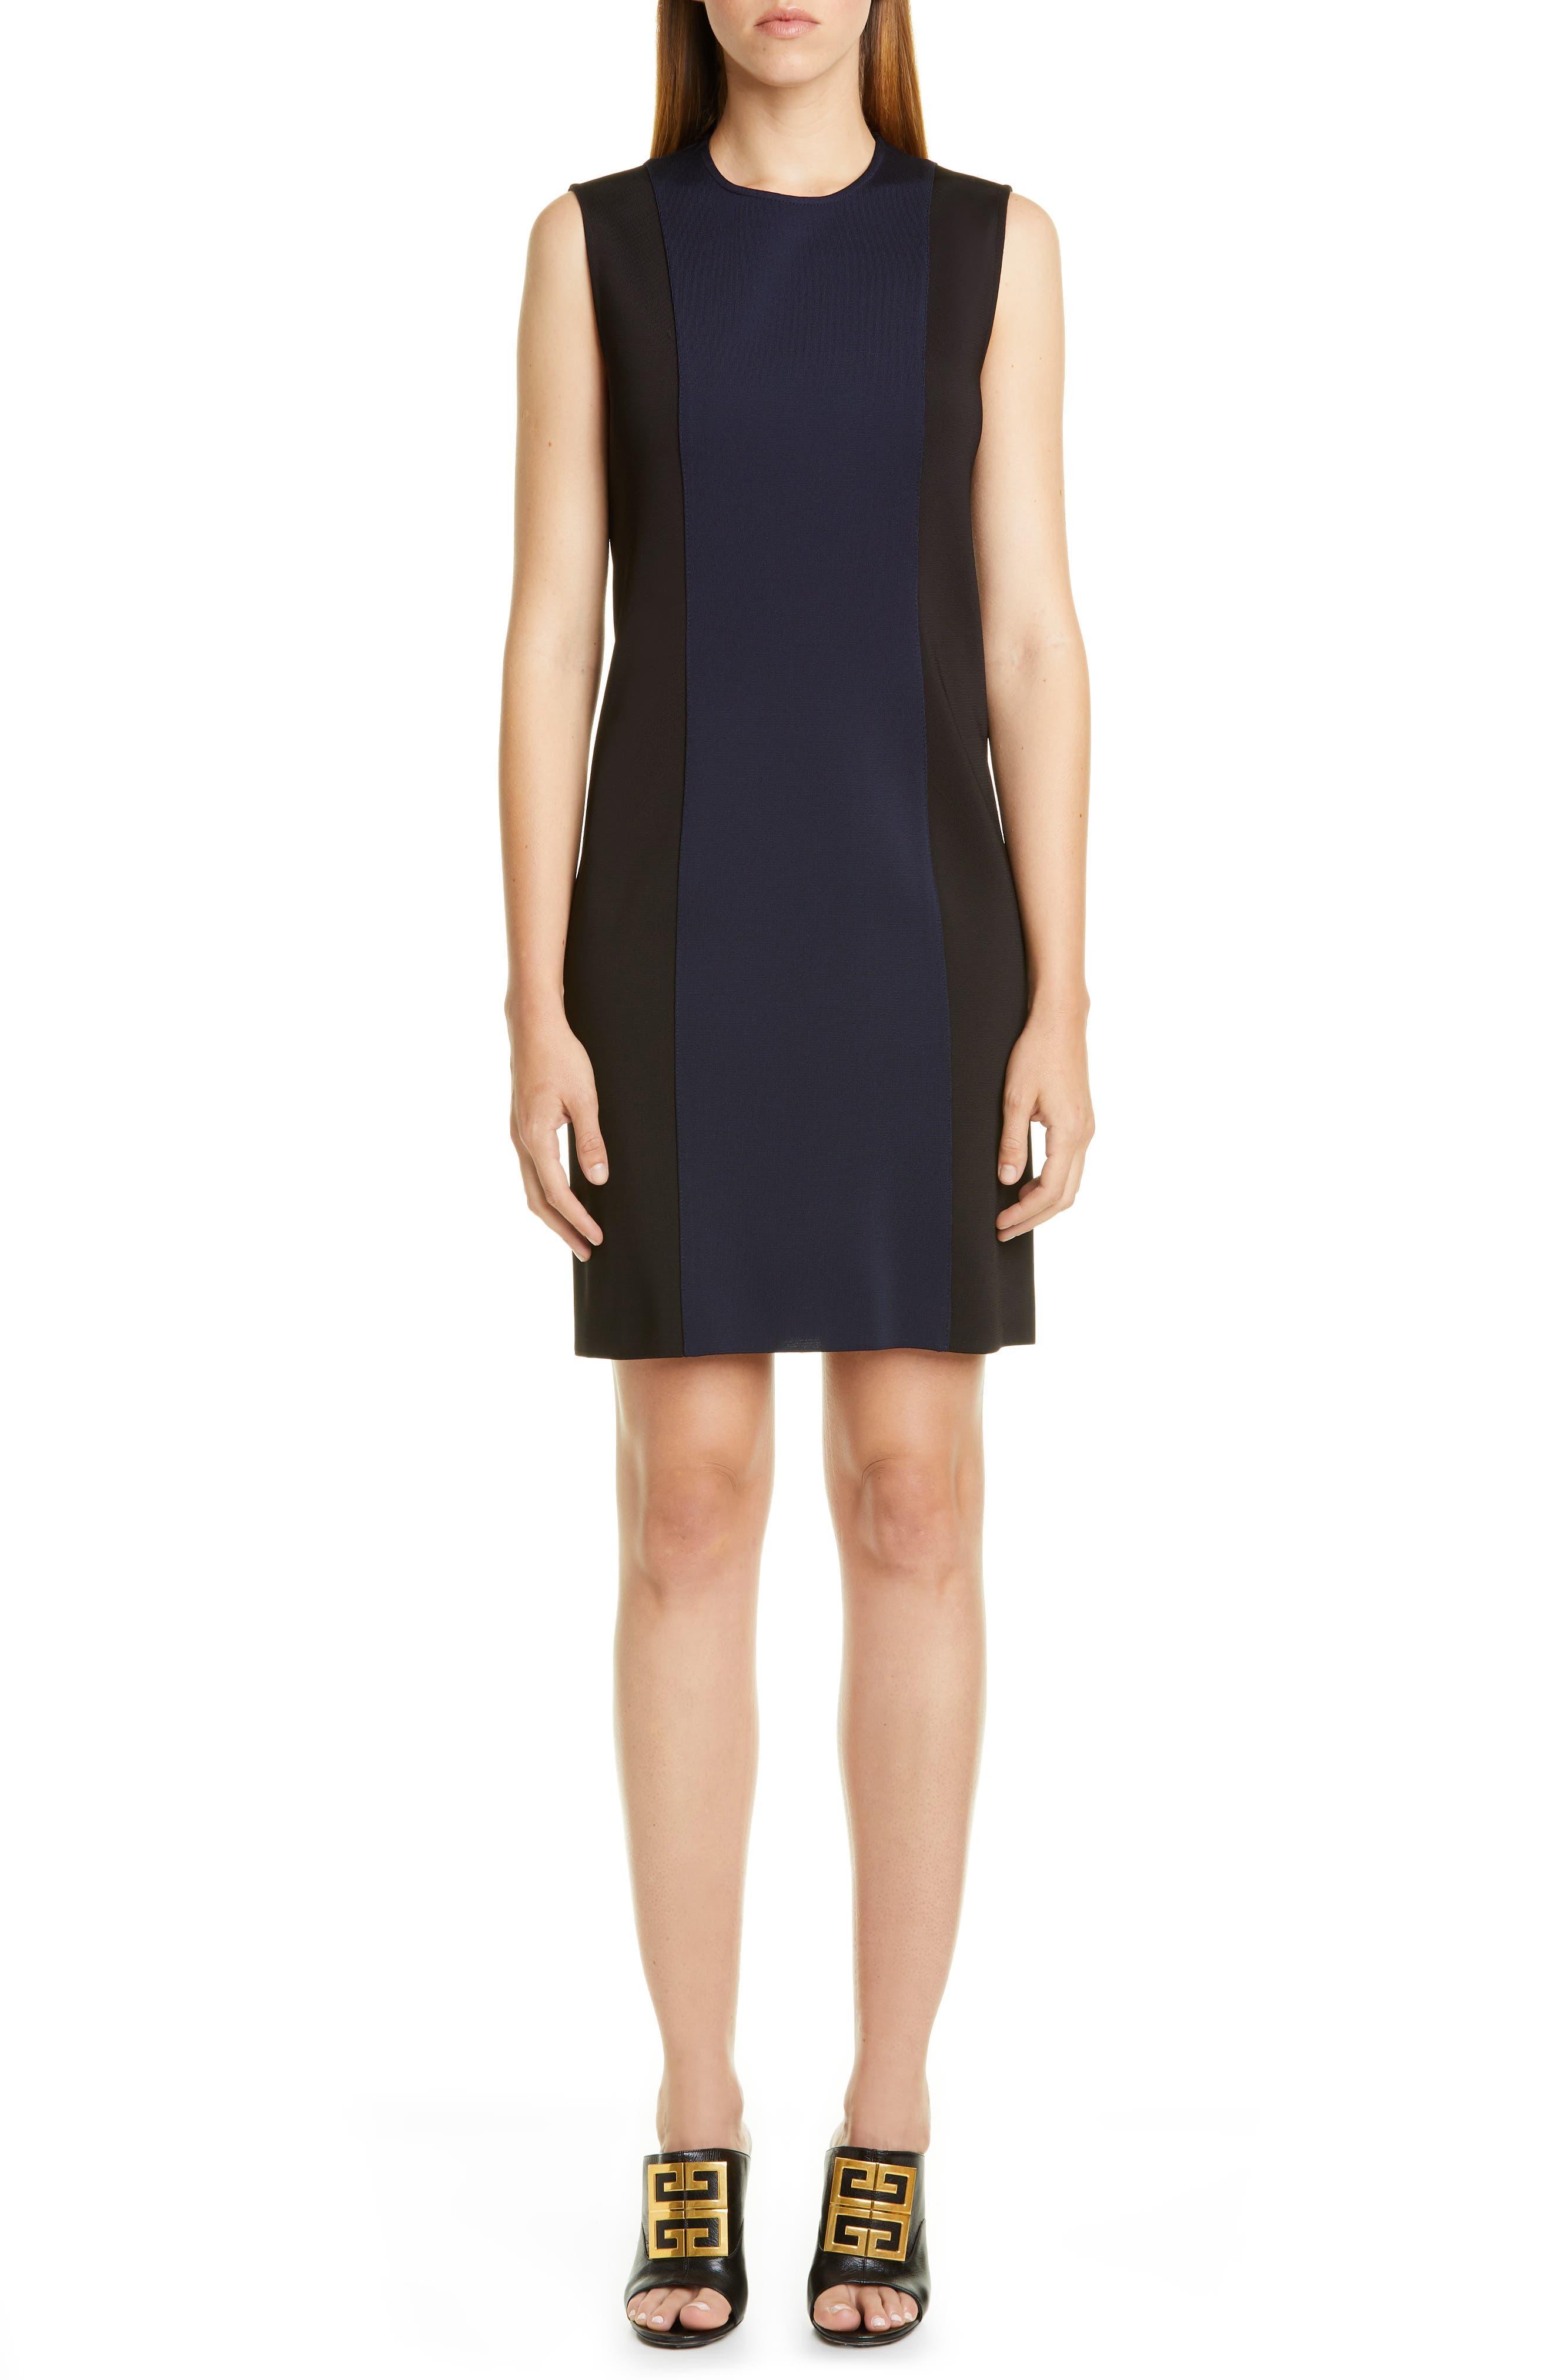 Givenchy Two-Tone Punto Milano Dress, Black